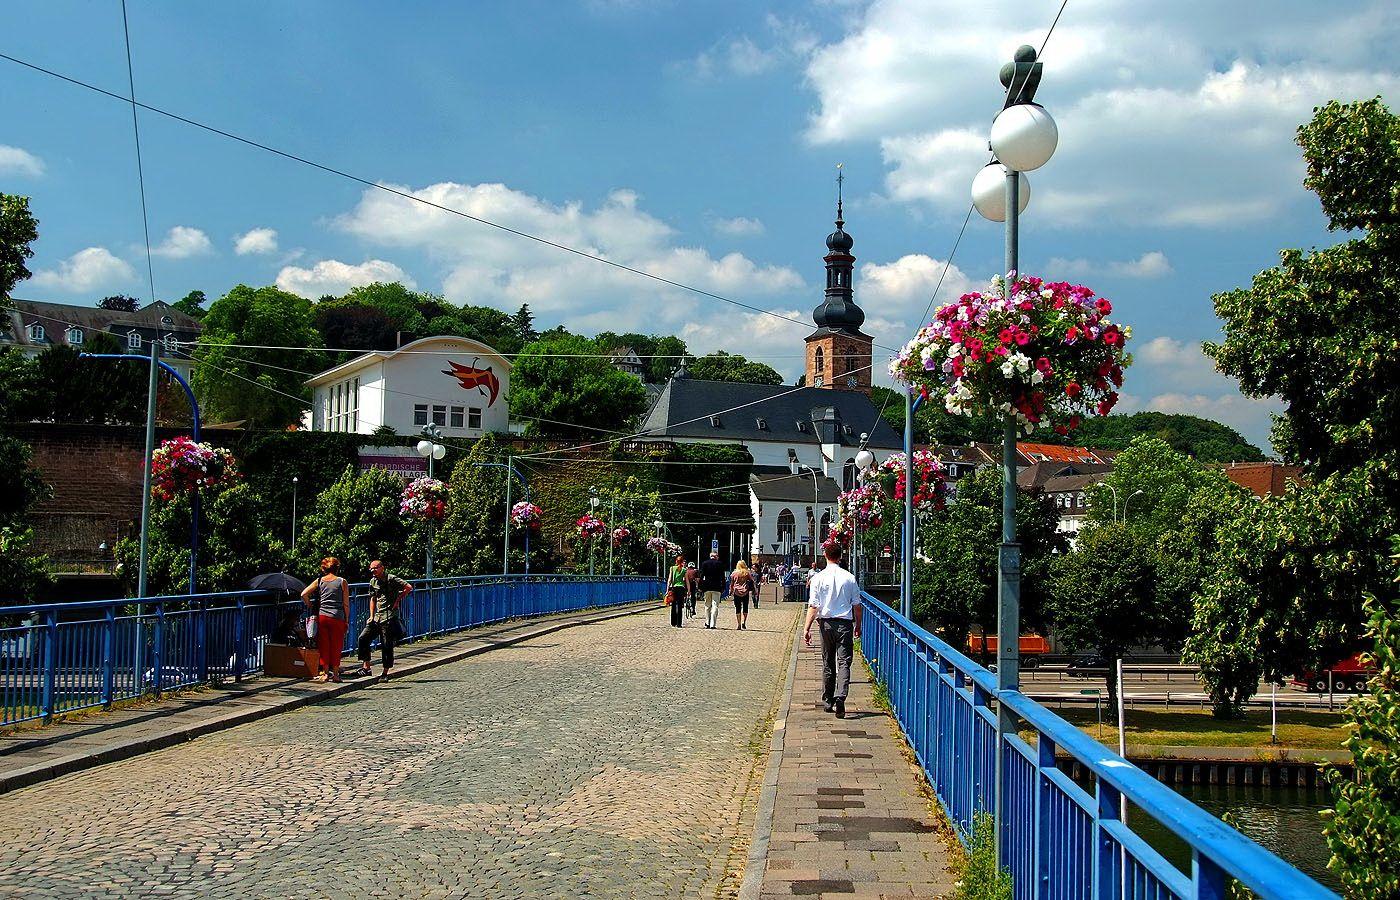 Wetter Heute In Saarbrücken